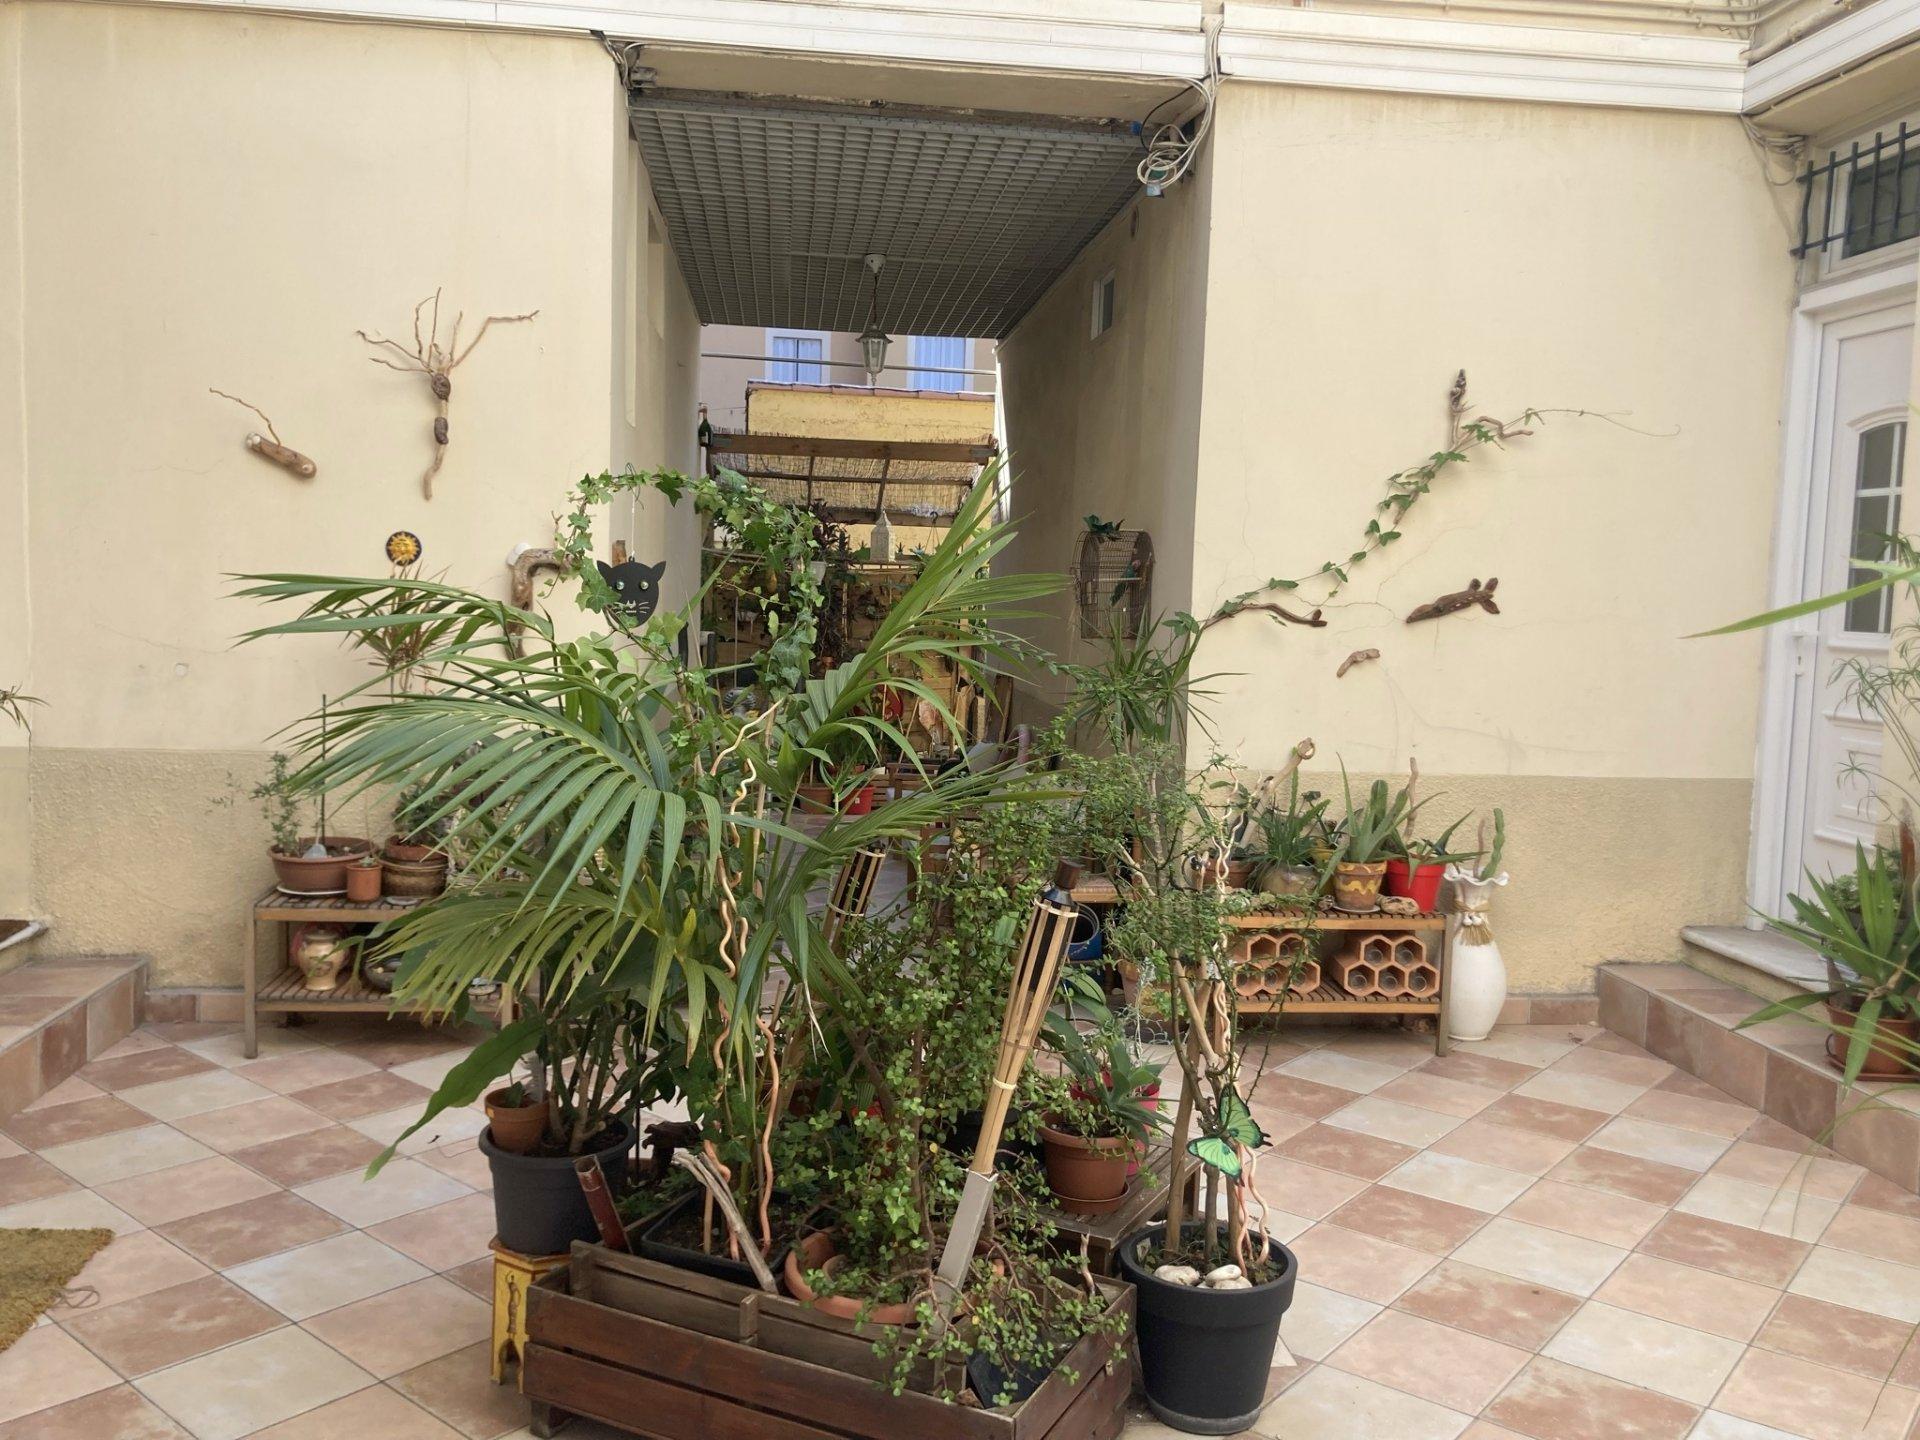 Affitto Appartamento - Nizza (Nice) Saint Augustin